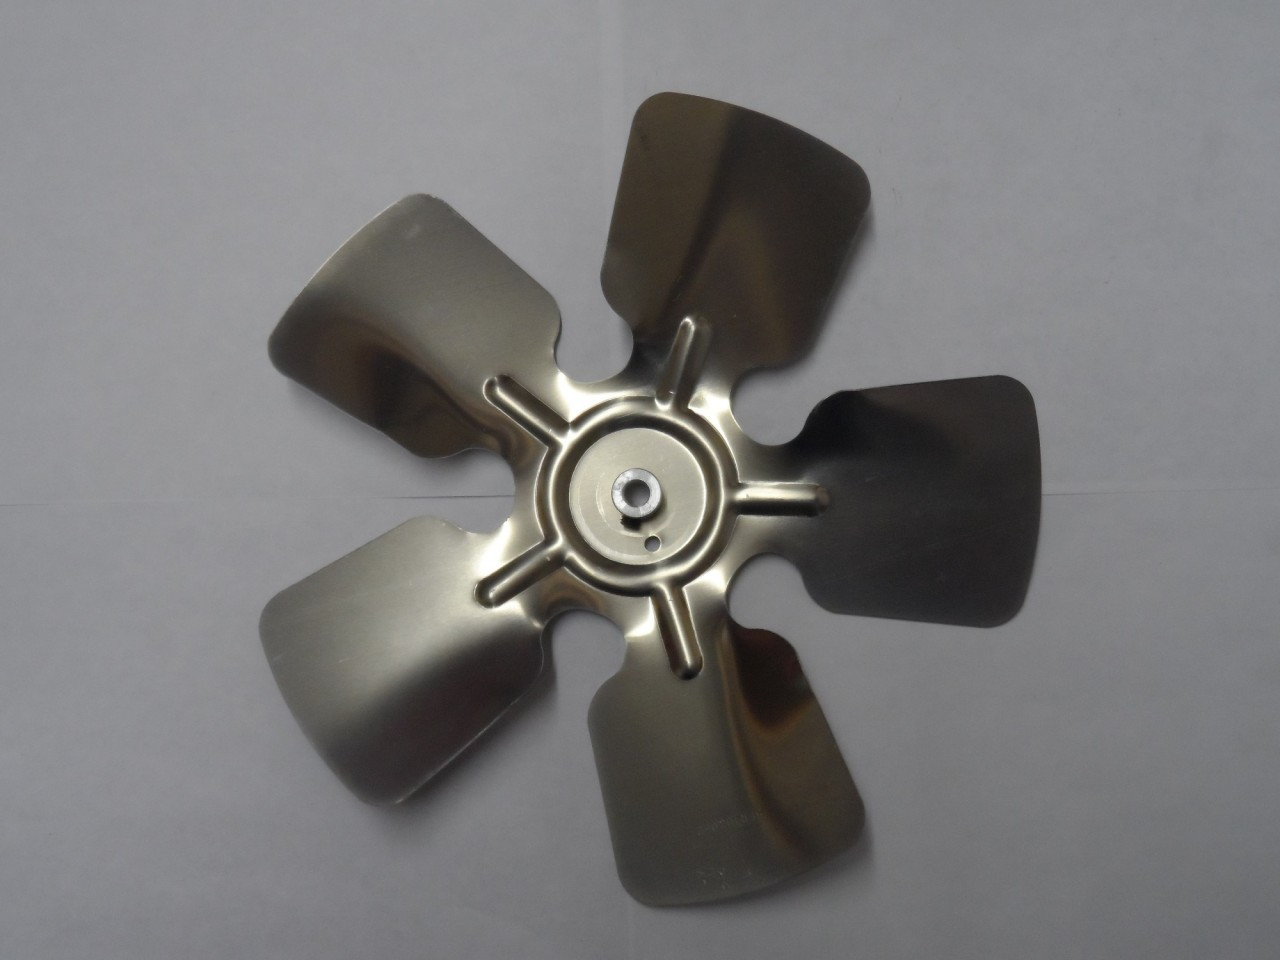 926CCWB 9 Fan Blade (CCW 5/16 Bore) #787353